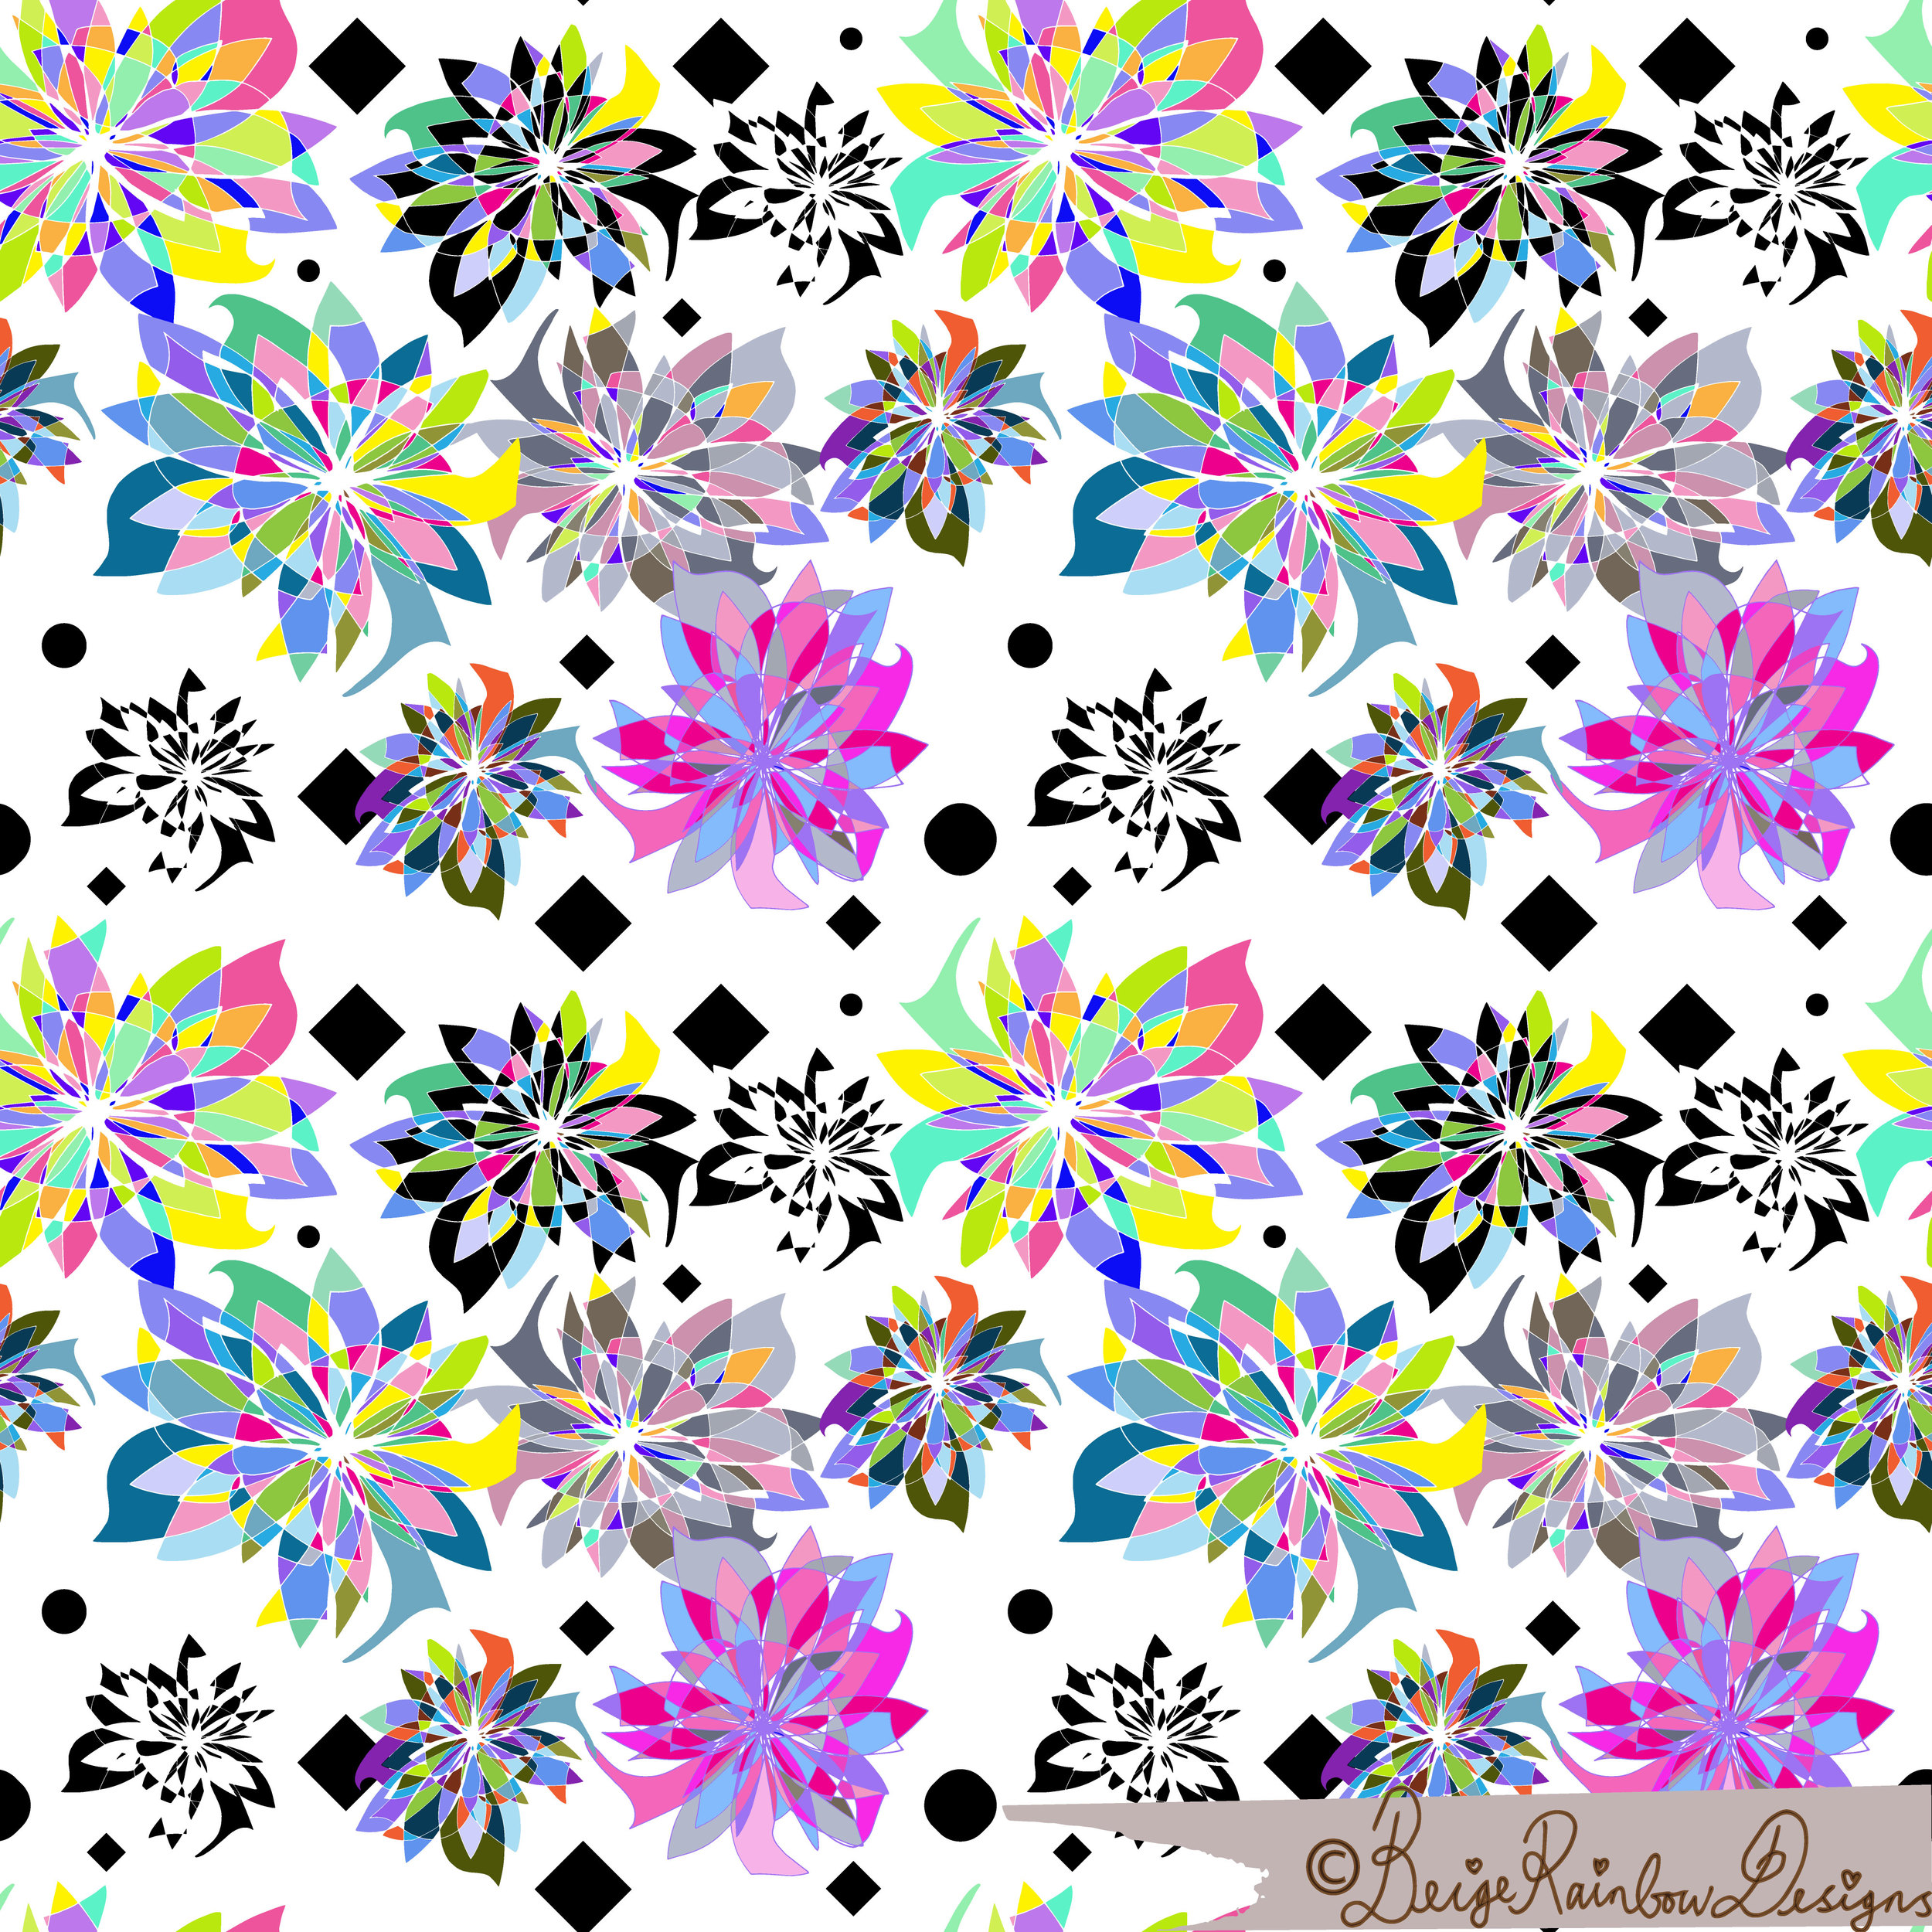 Shattered-diamond-pattern-finished-for-webby.jpg